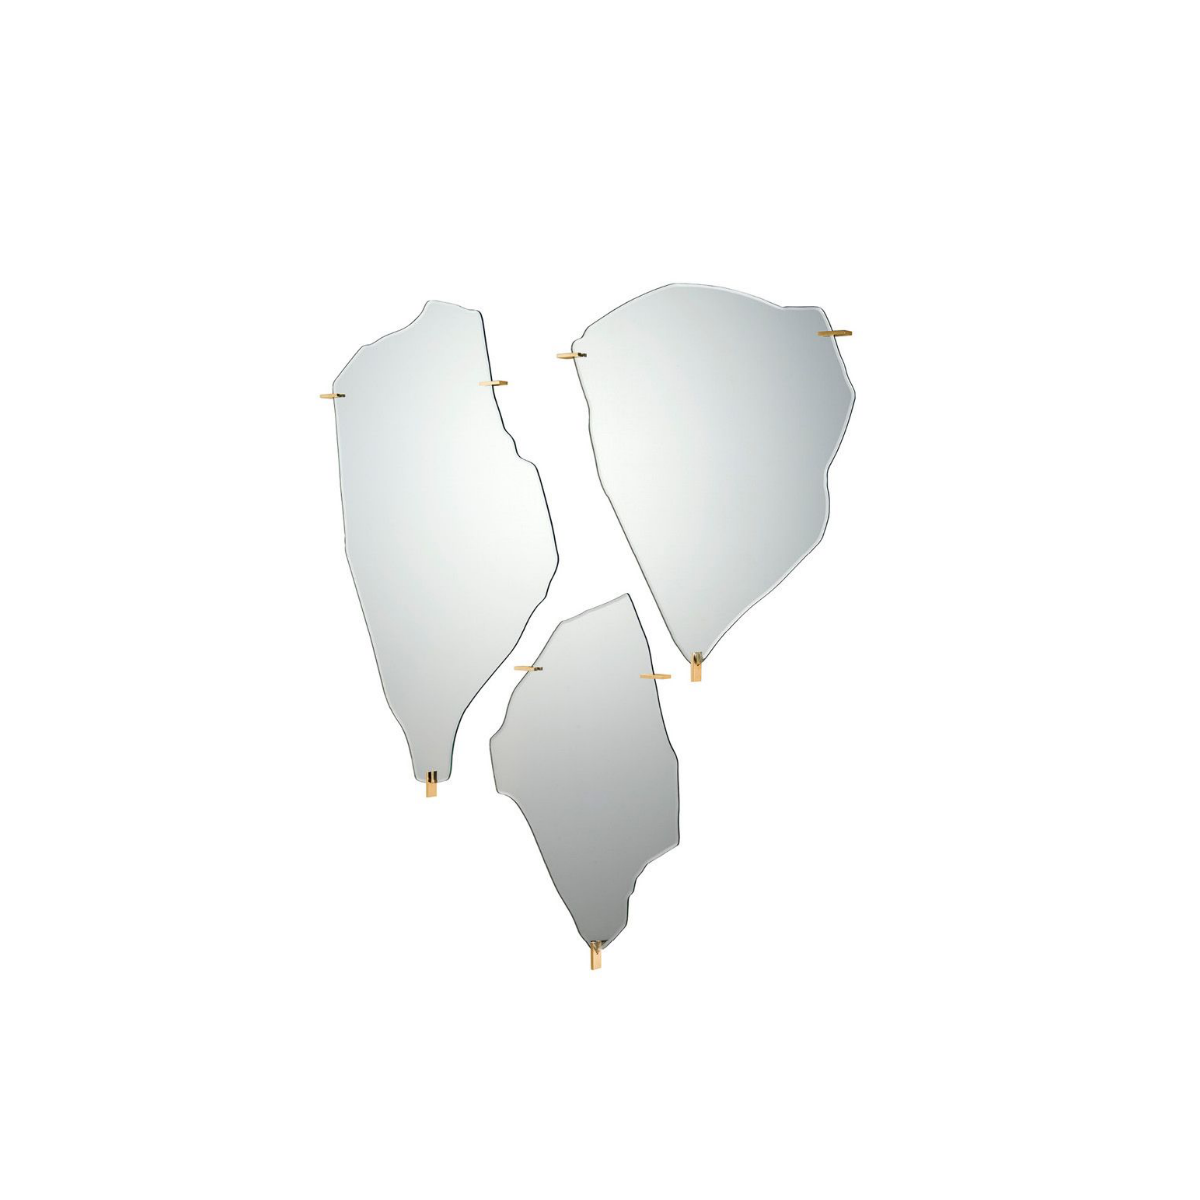 Driade specchio Archipelago